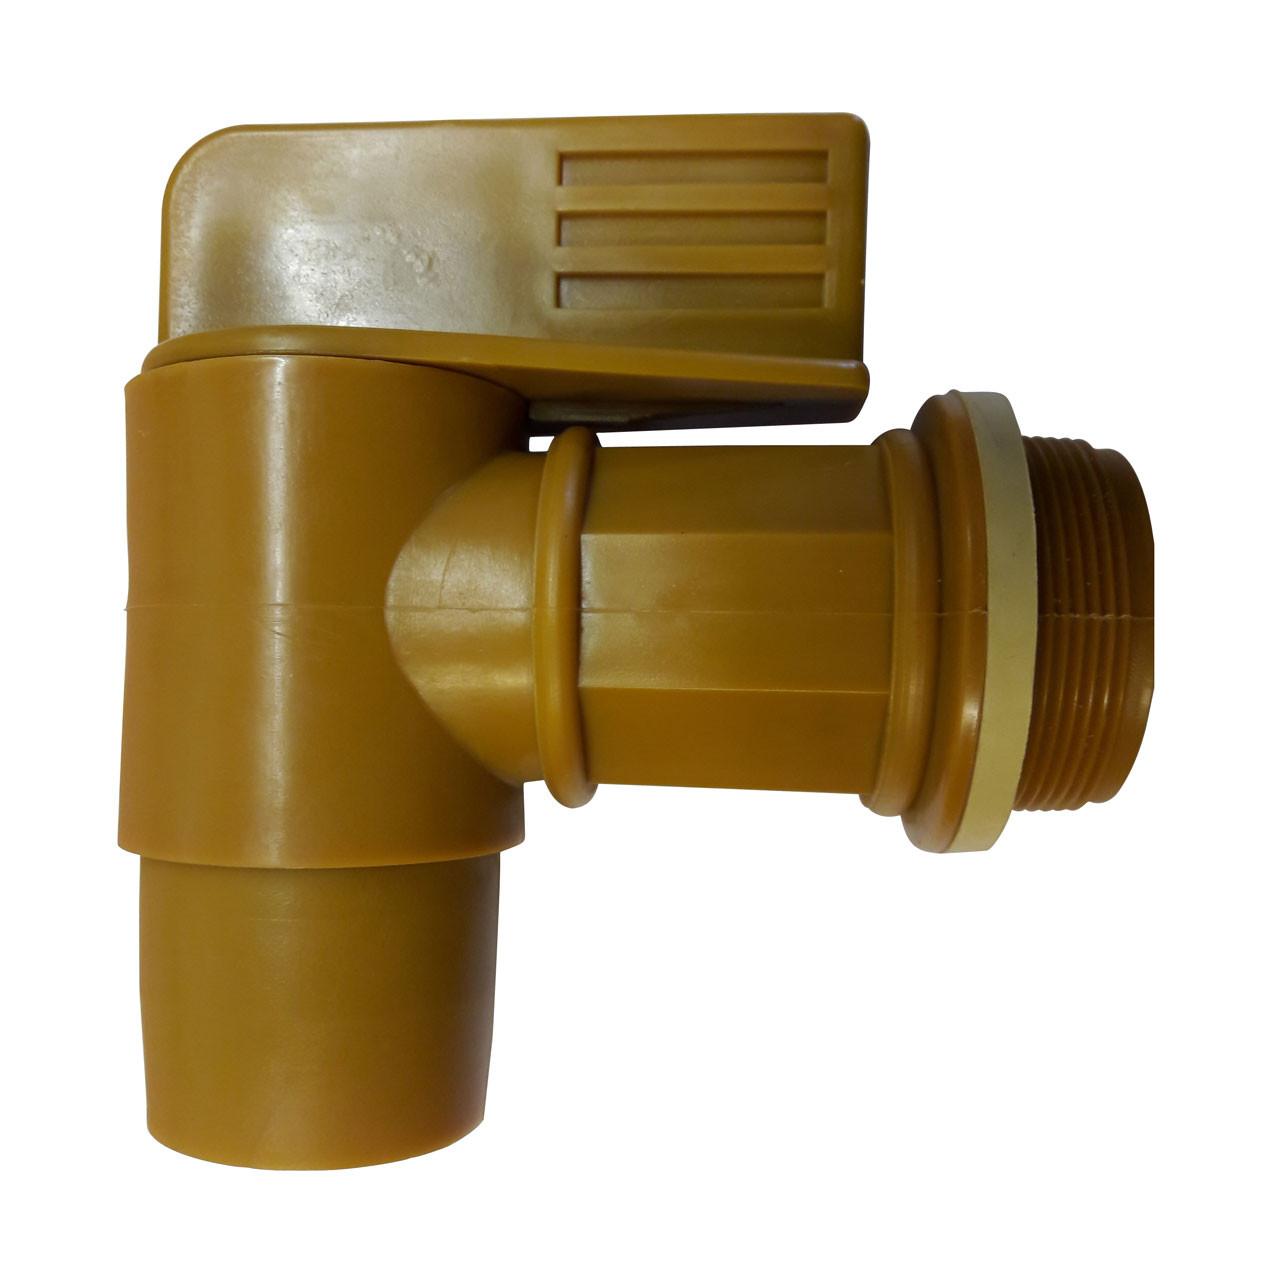 2 in. High Flow Drum Faucet - John M. Ellsworth Co. Inc.